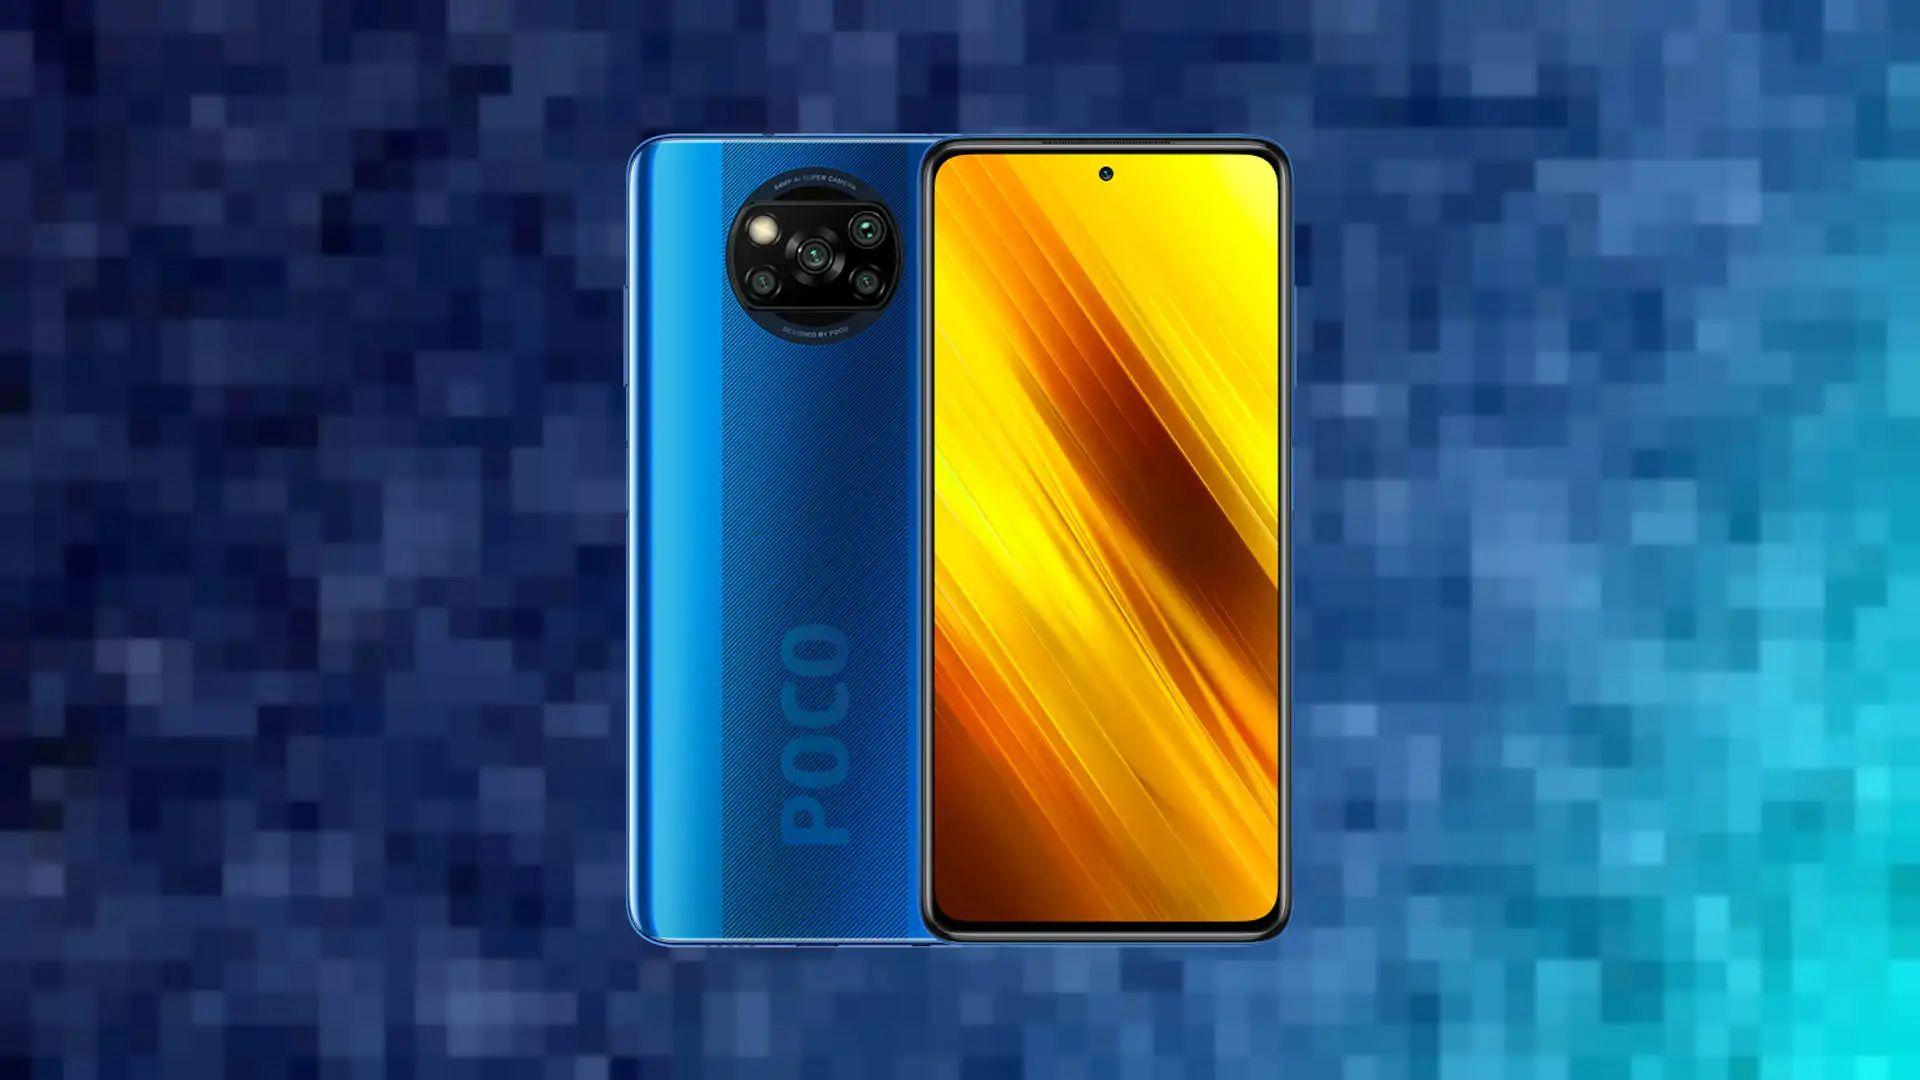 POCO X3 NFC 6/64 GB – GShopper